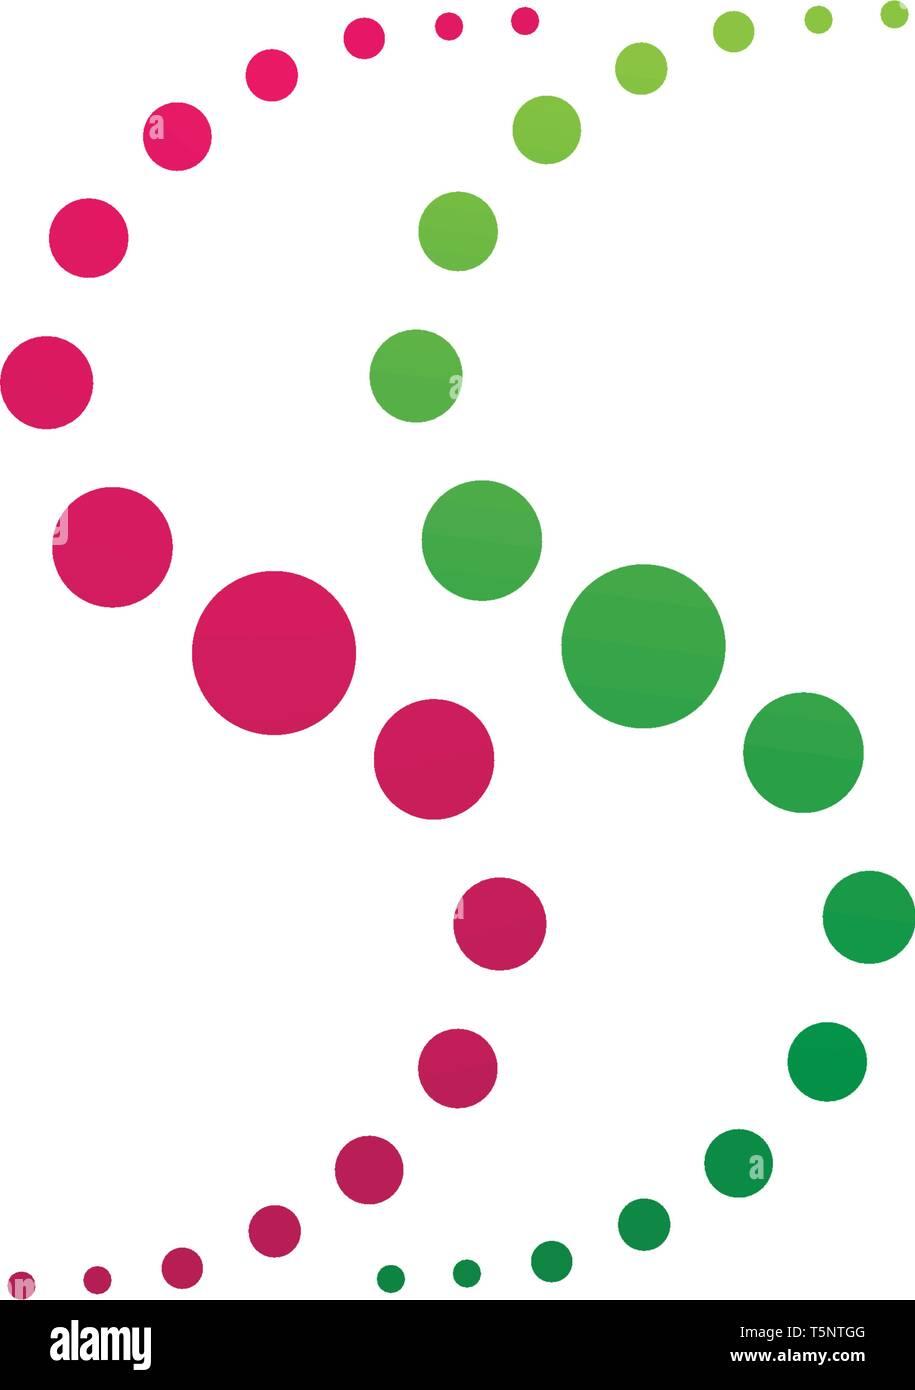 vortex circle logo and symbols template icons - Stock Vector